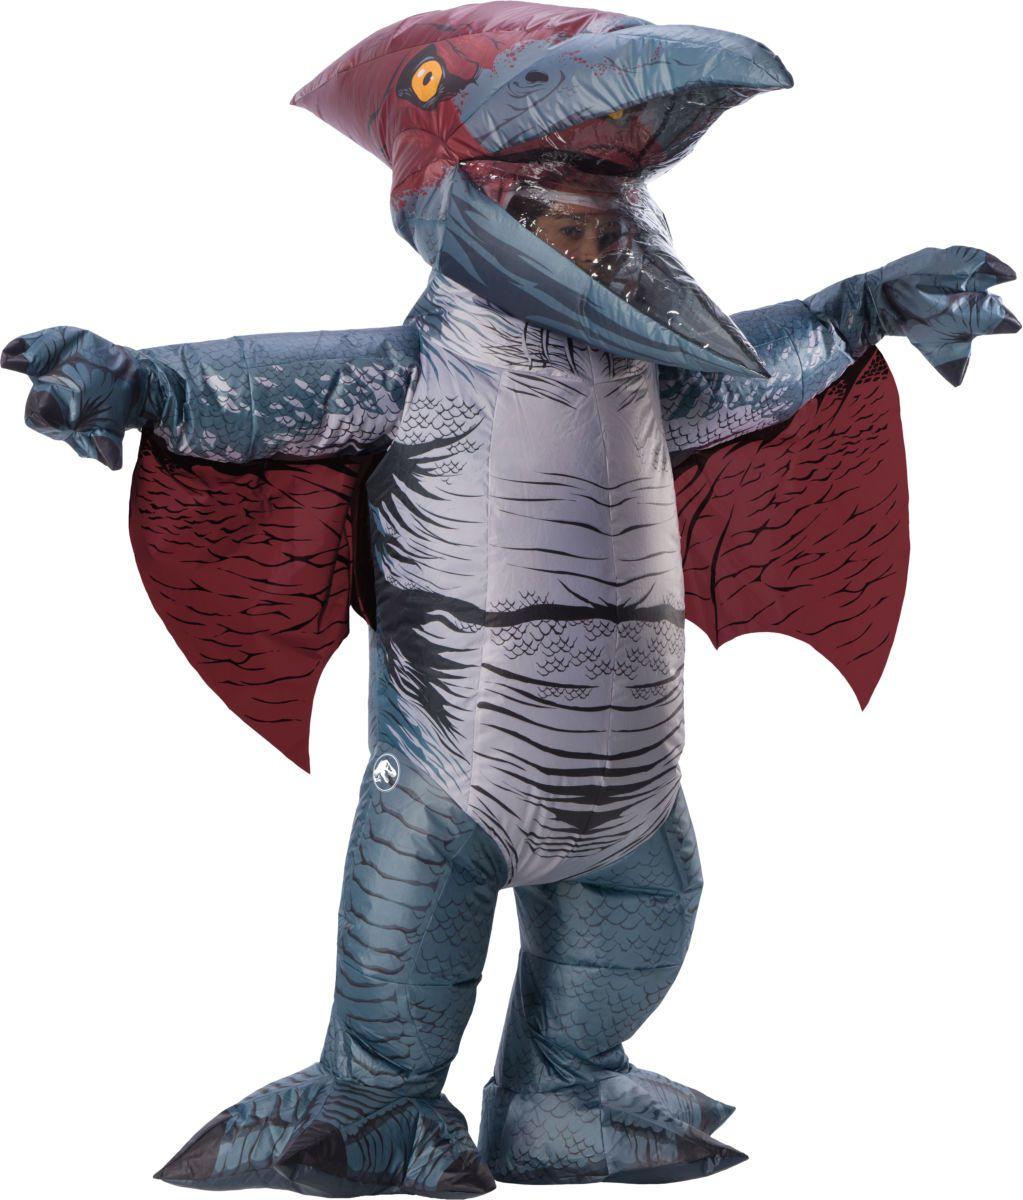 Fantasia Pteranodonte Inflável - Rubies Costume - CD